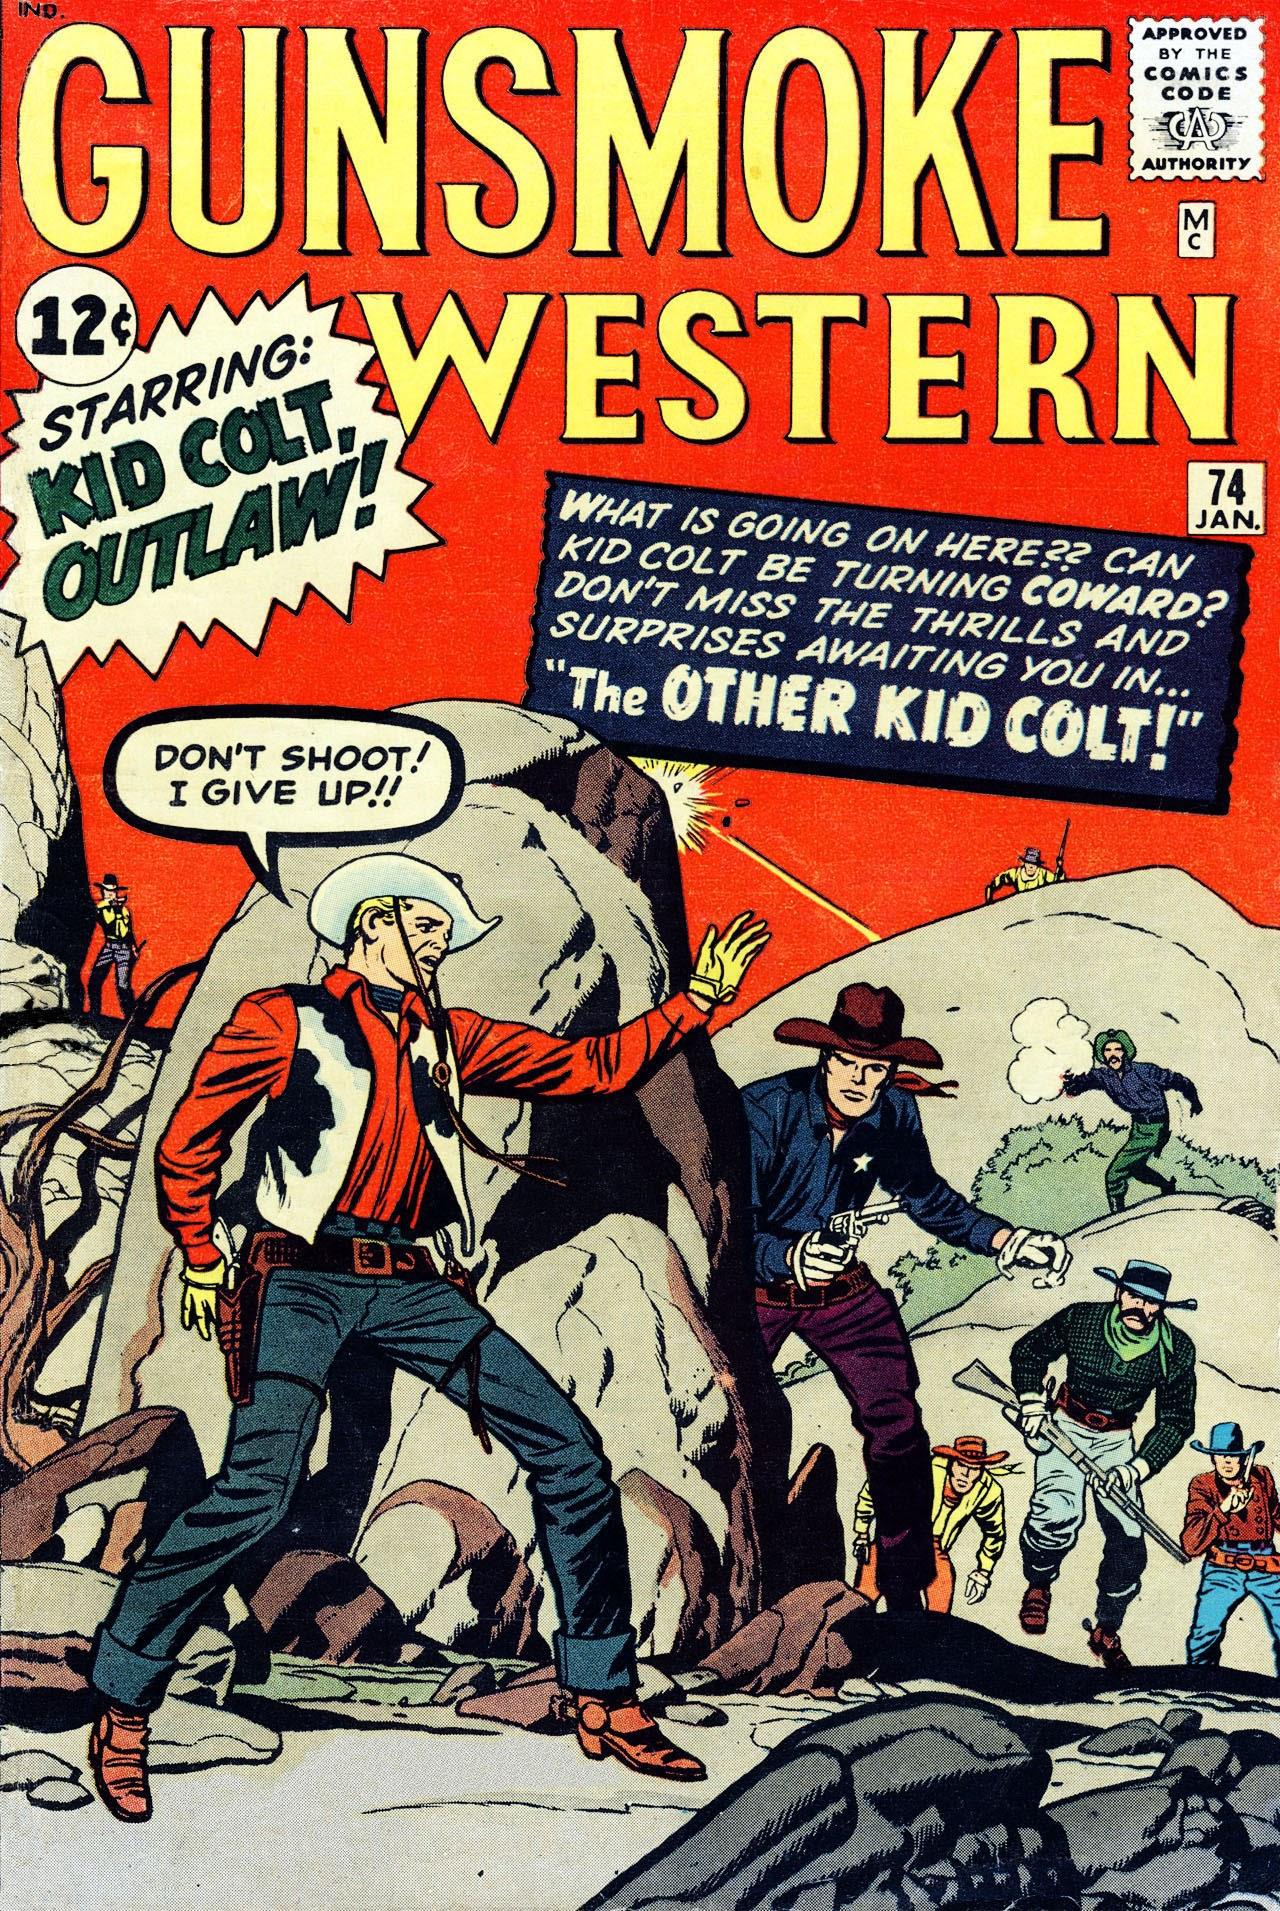 Gunsmoke Western 74 Page 1